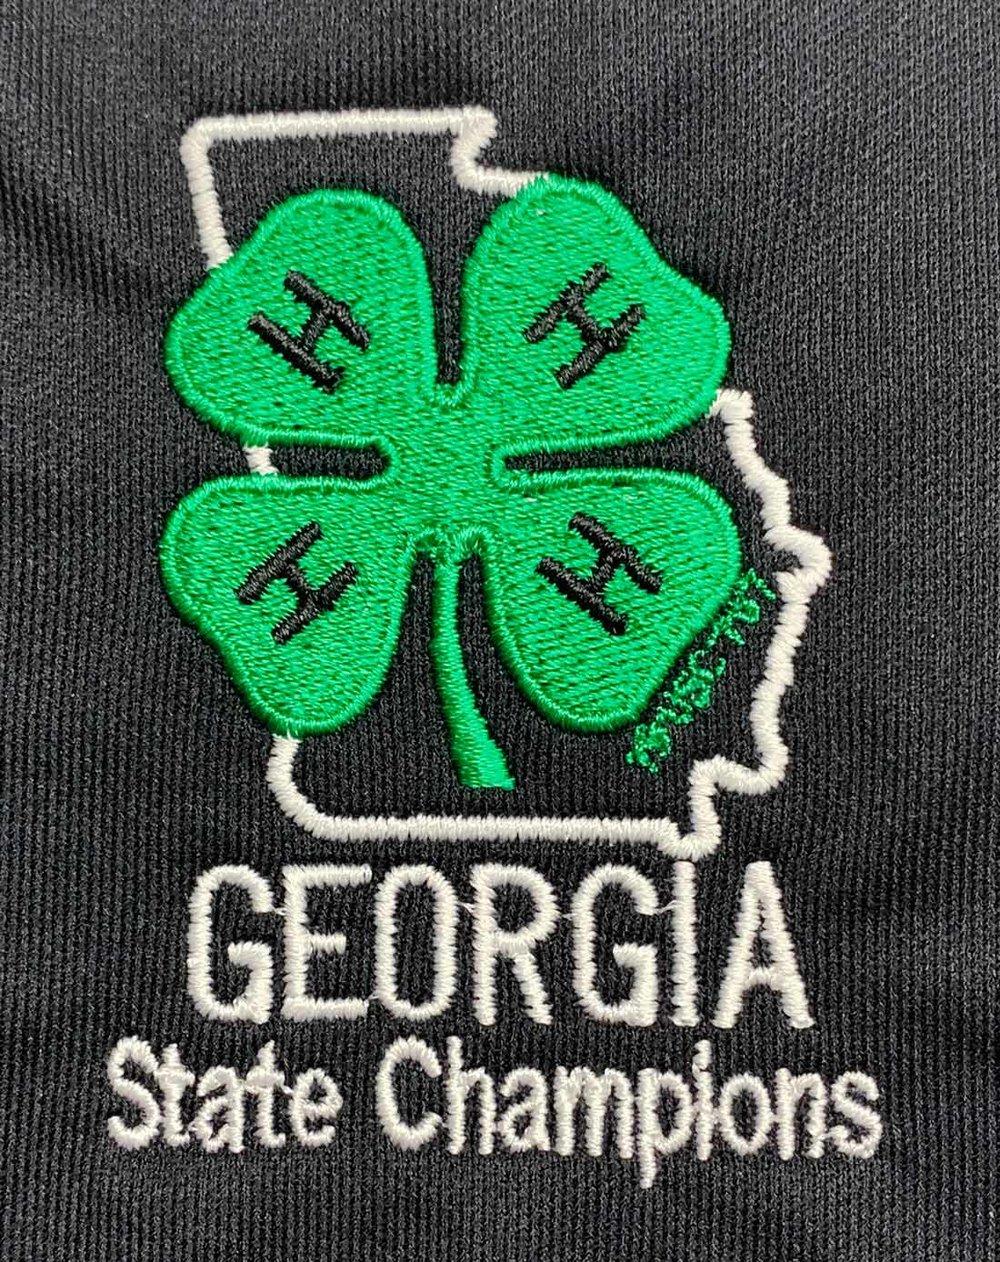 KYC_GEORGIA-STATE-CHAMPIONS_web.jpg